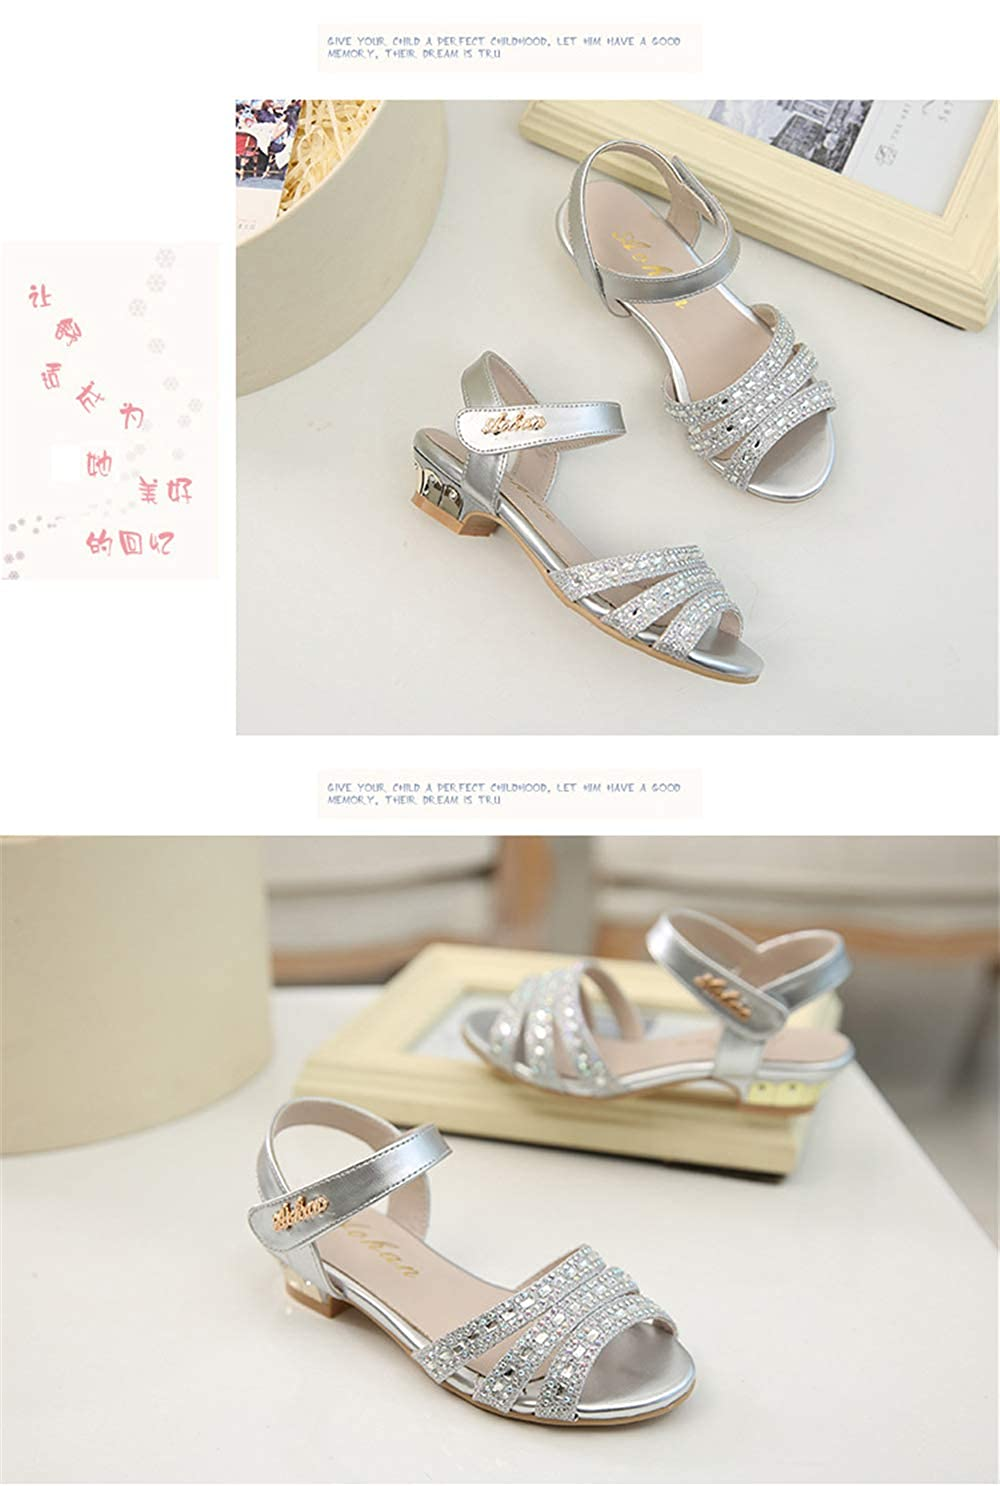 MaxTide Toddler Girls Pearls Ankle Strap Bling Ballet Flats Princess Dress Shoes